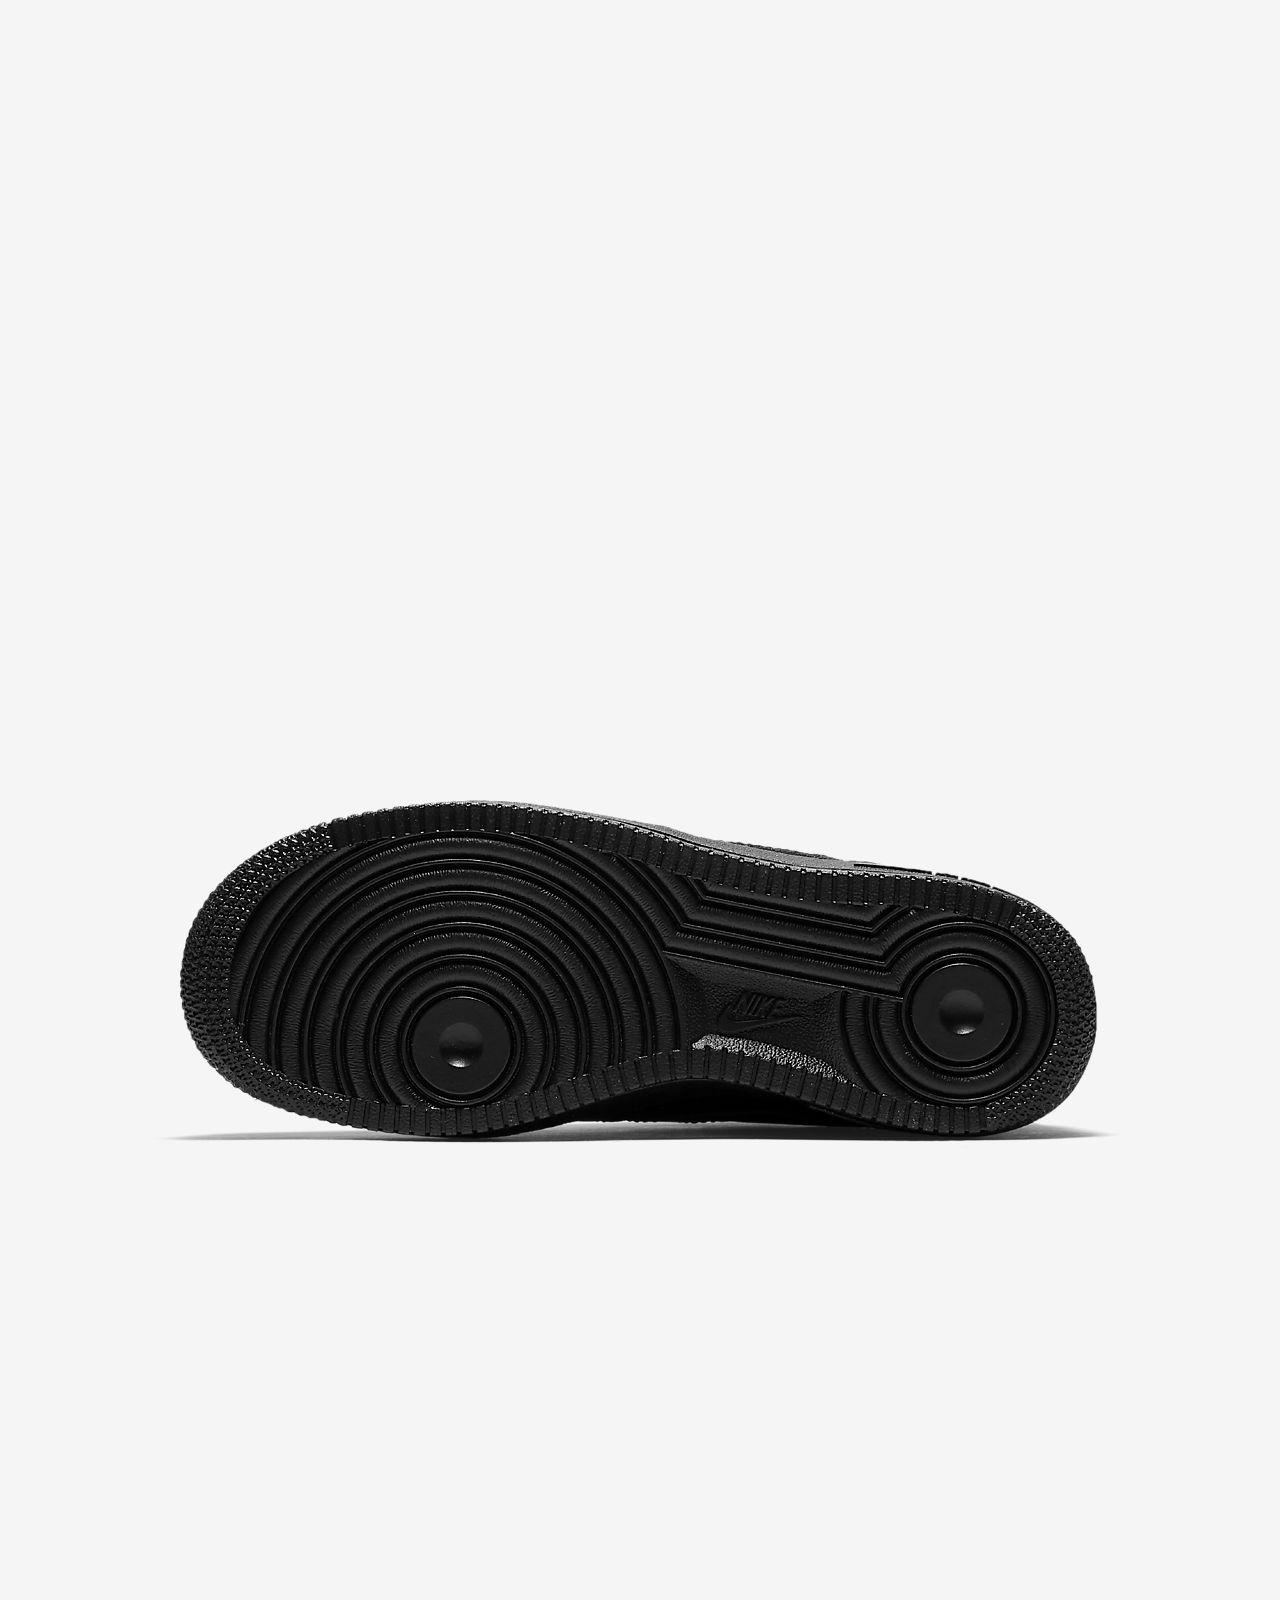 d097e019cc0 Calzado para niños talla grande Nike Air Force 1. Nike.com CL